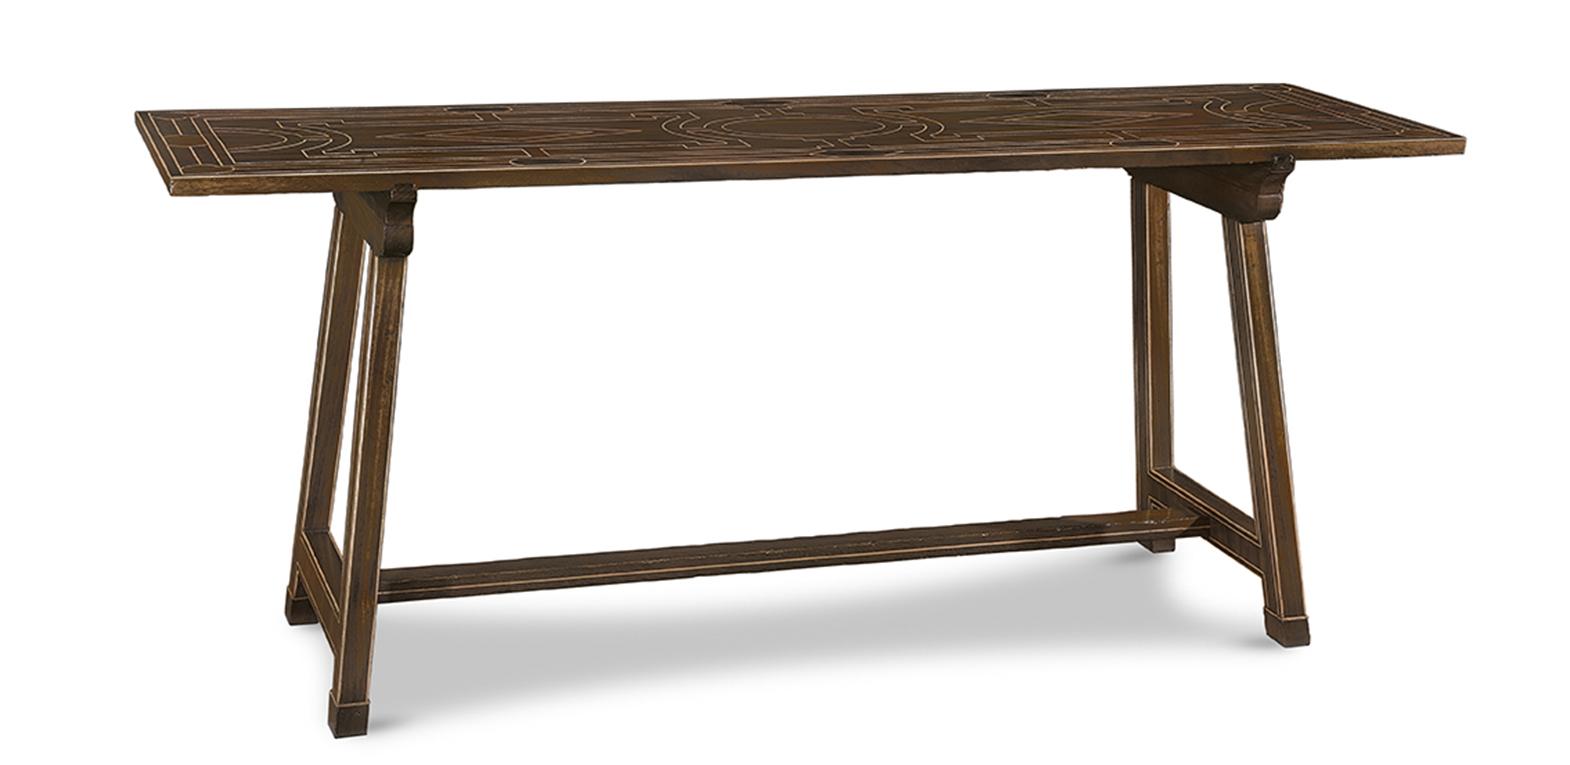 Table Sofa Images Coffee Table Design Ideas : genova sofa table from geotapseo.com size 1570 x 765 jpeg 308kB